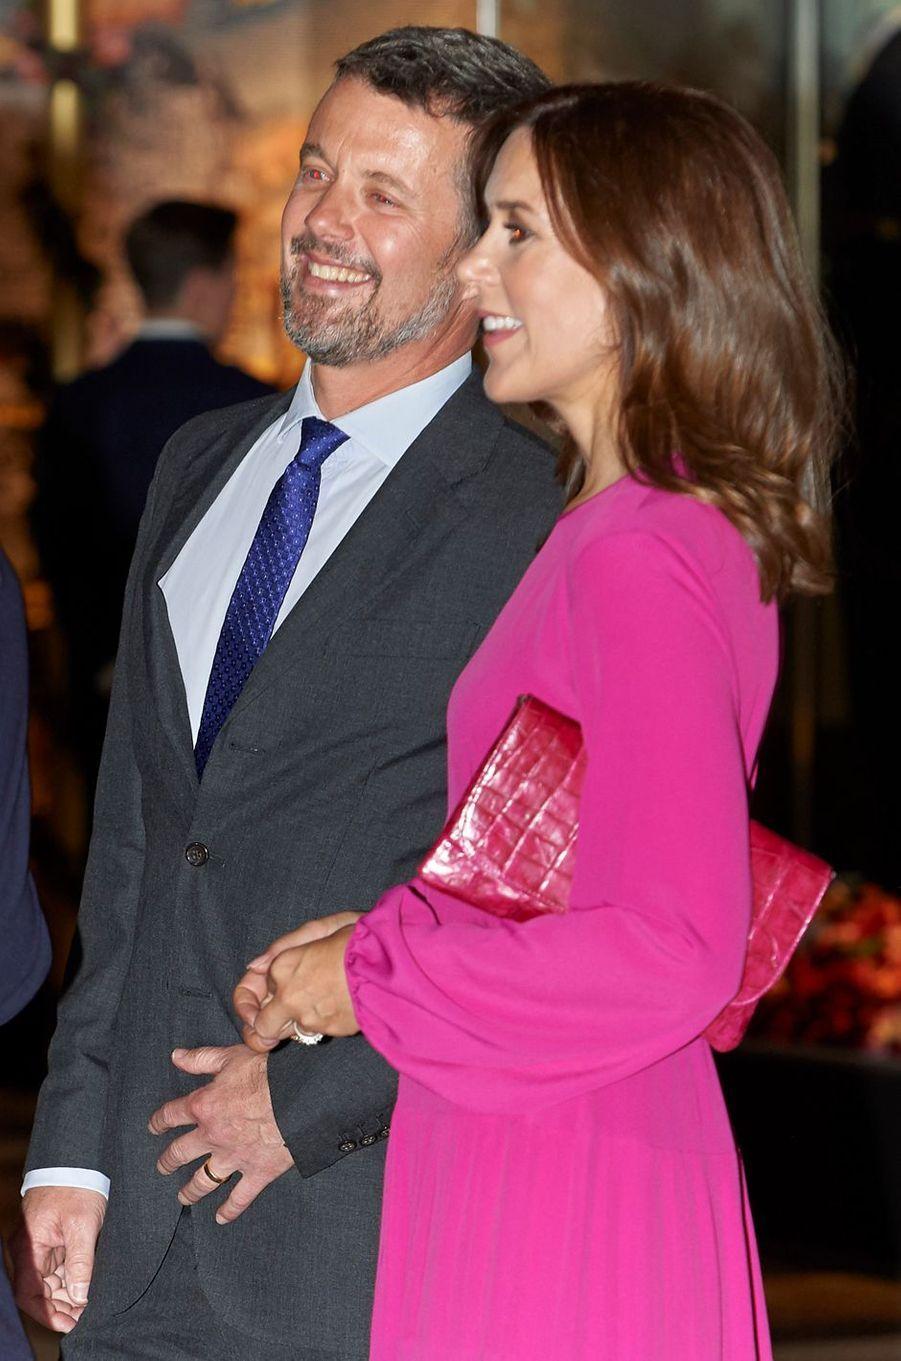 Le prince Frederik de Danemark avec sa femme la princesse Mary, le 24 mai 2018